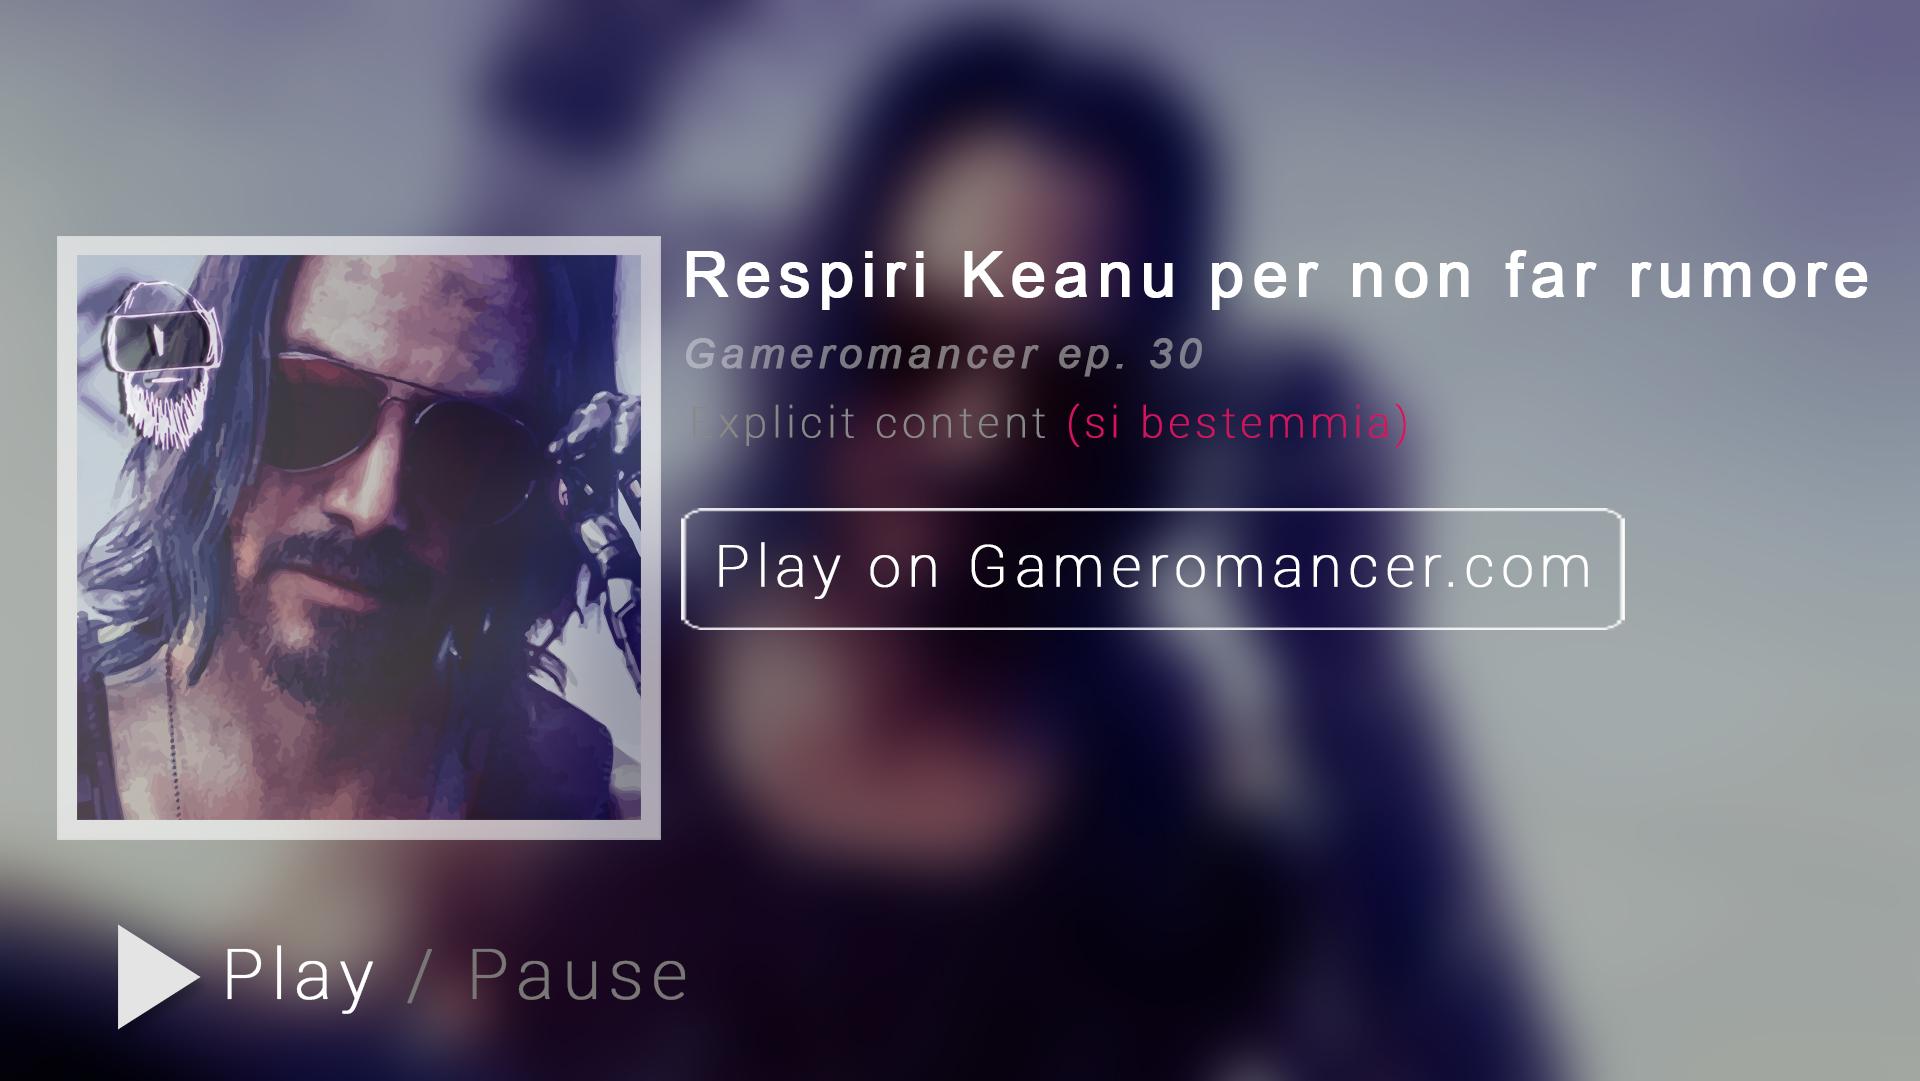 Ep. 30 - Respiri Keanu per non far rumore